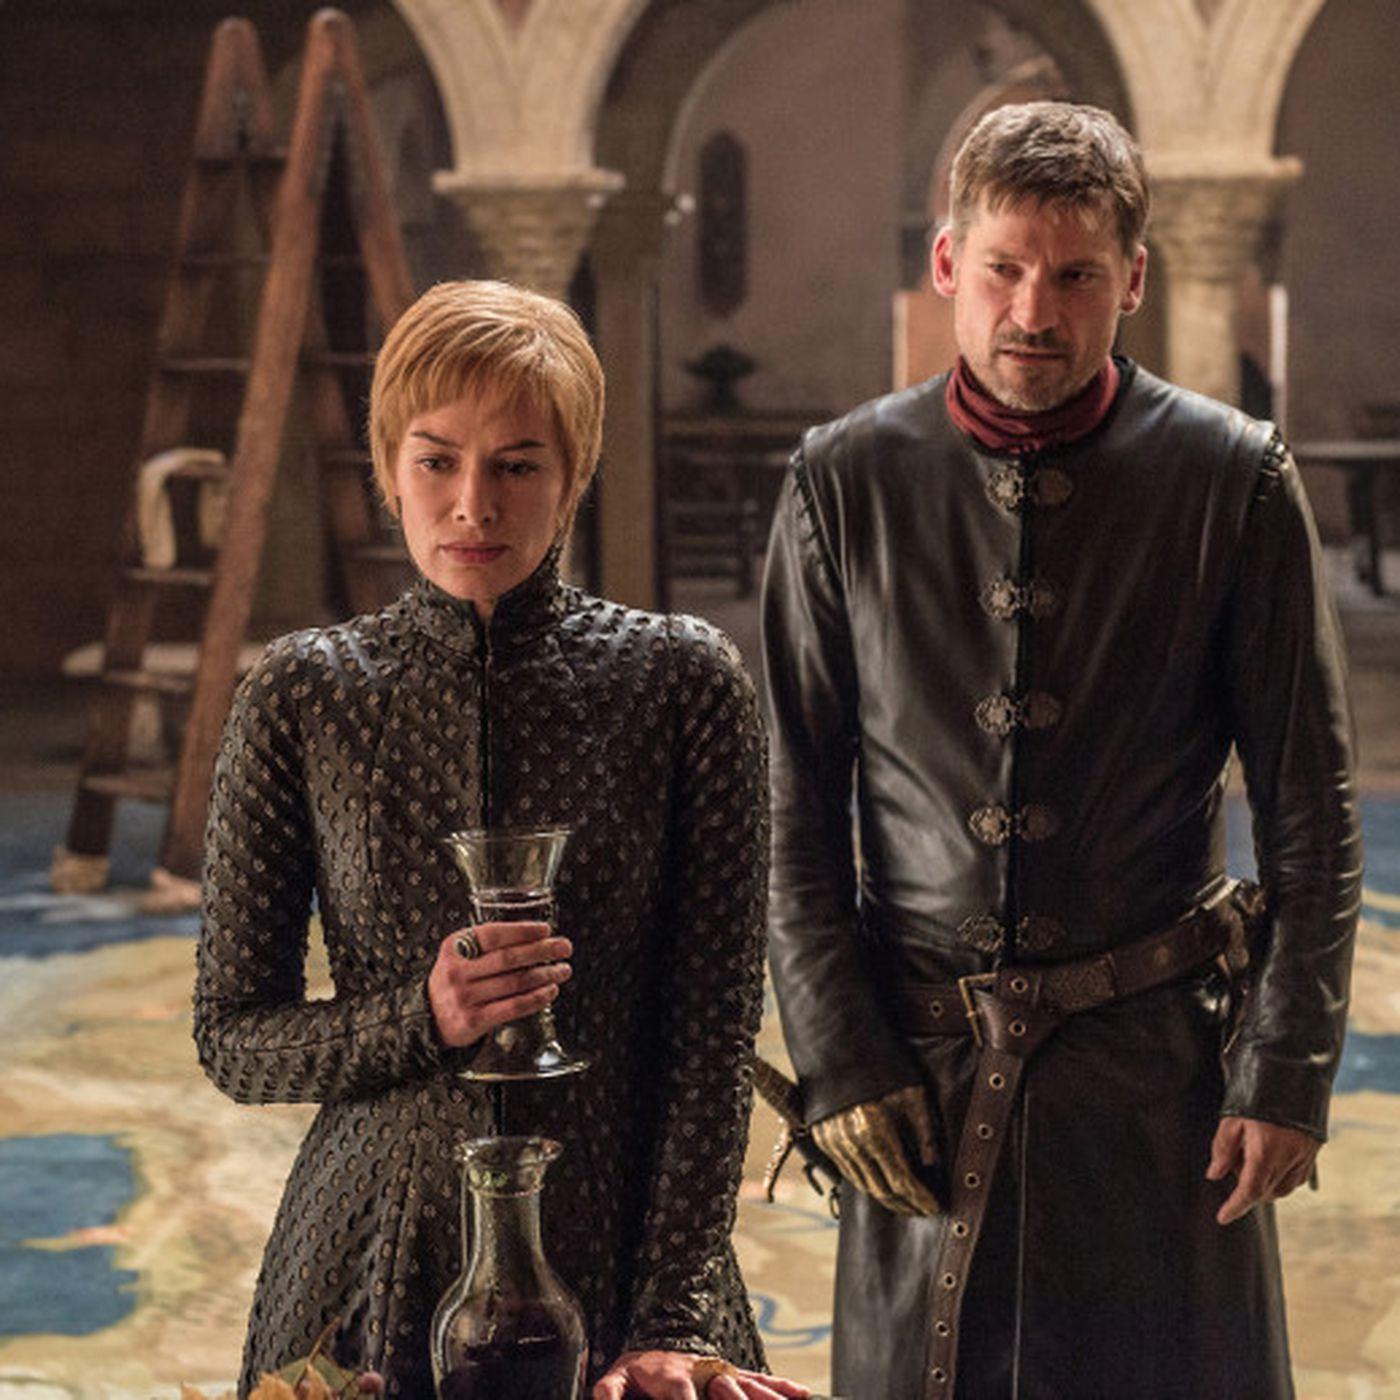 Game Of Thrones Season 8 Episode 5 Jaime Will Definitely